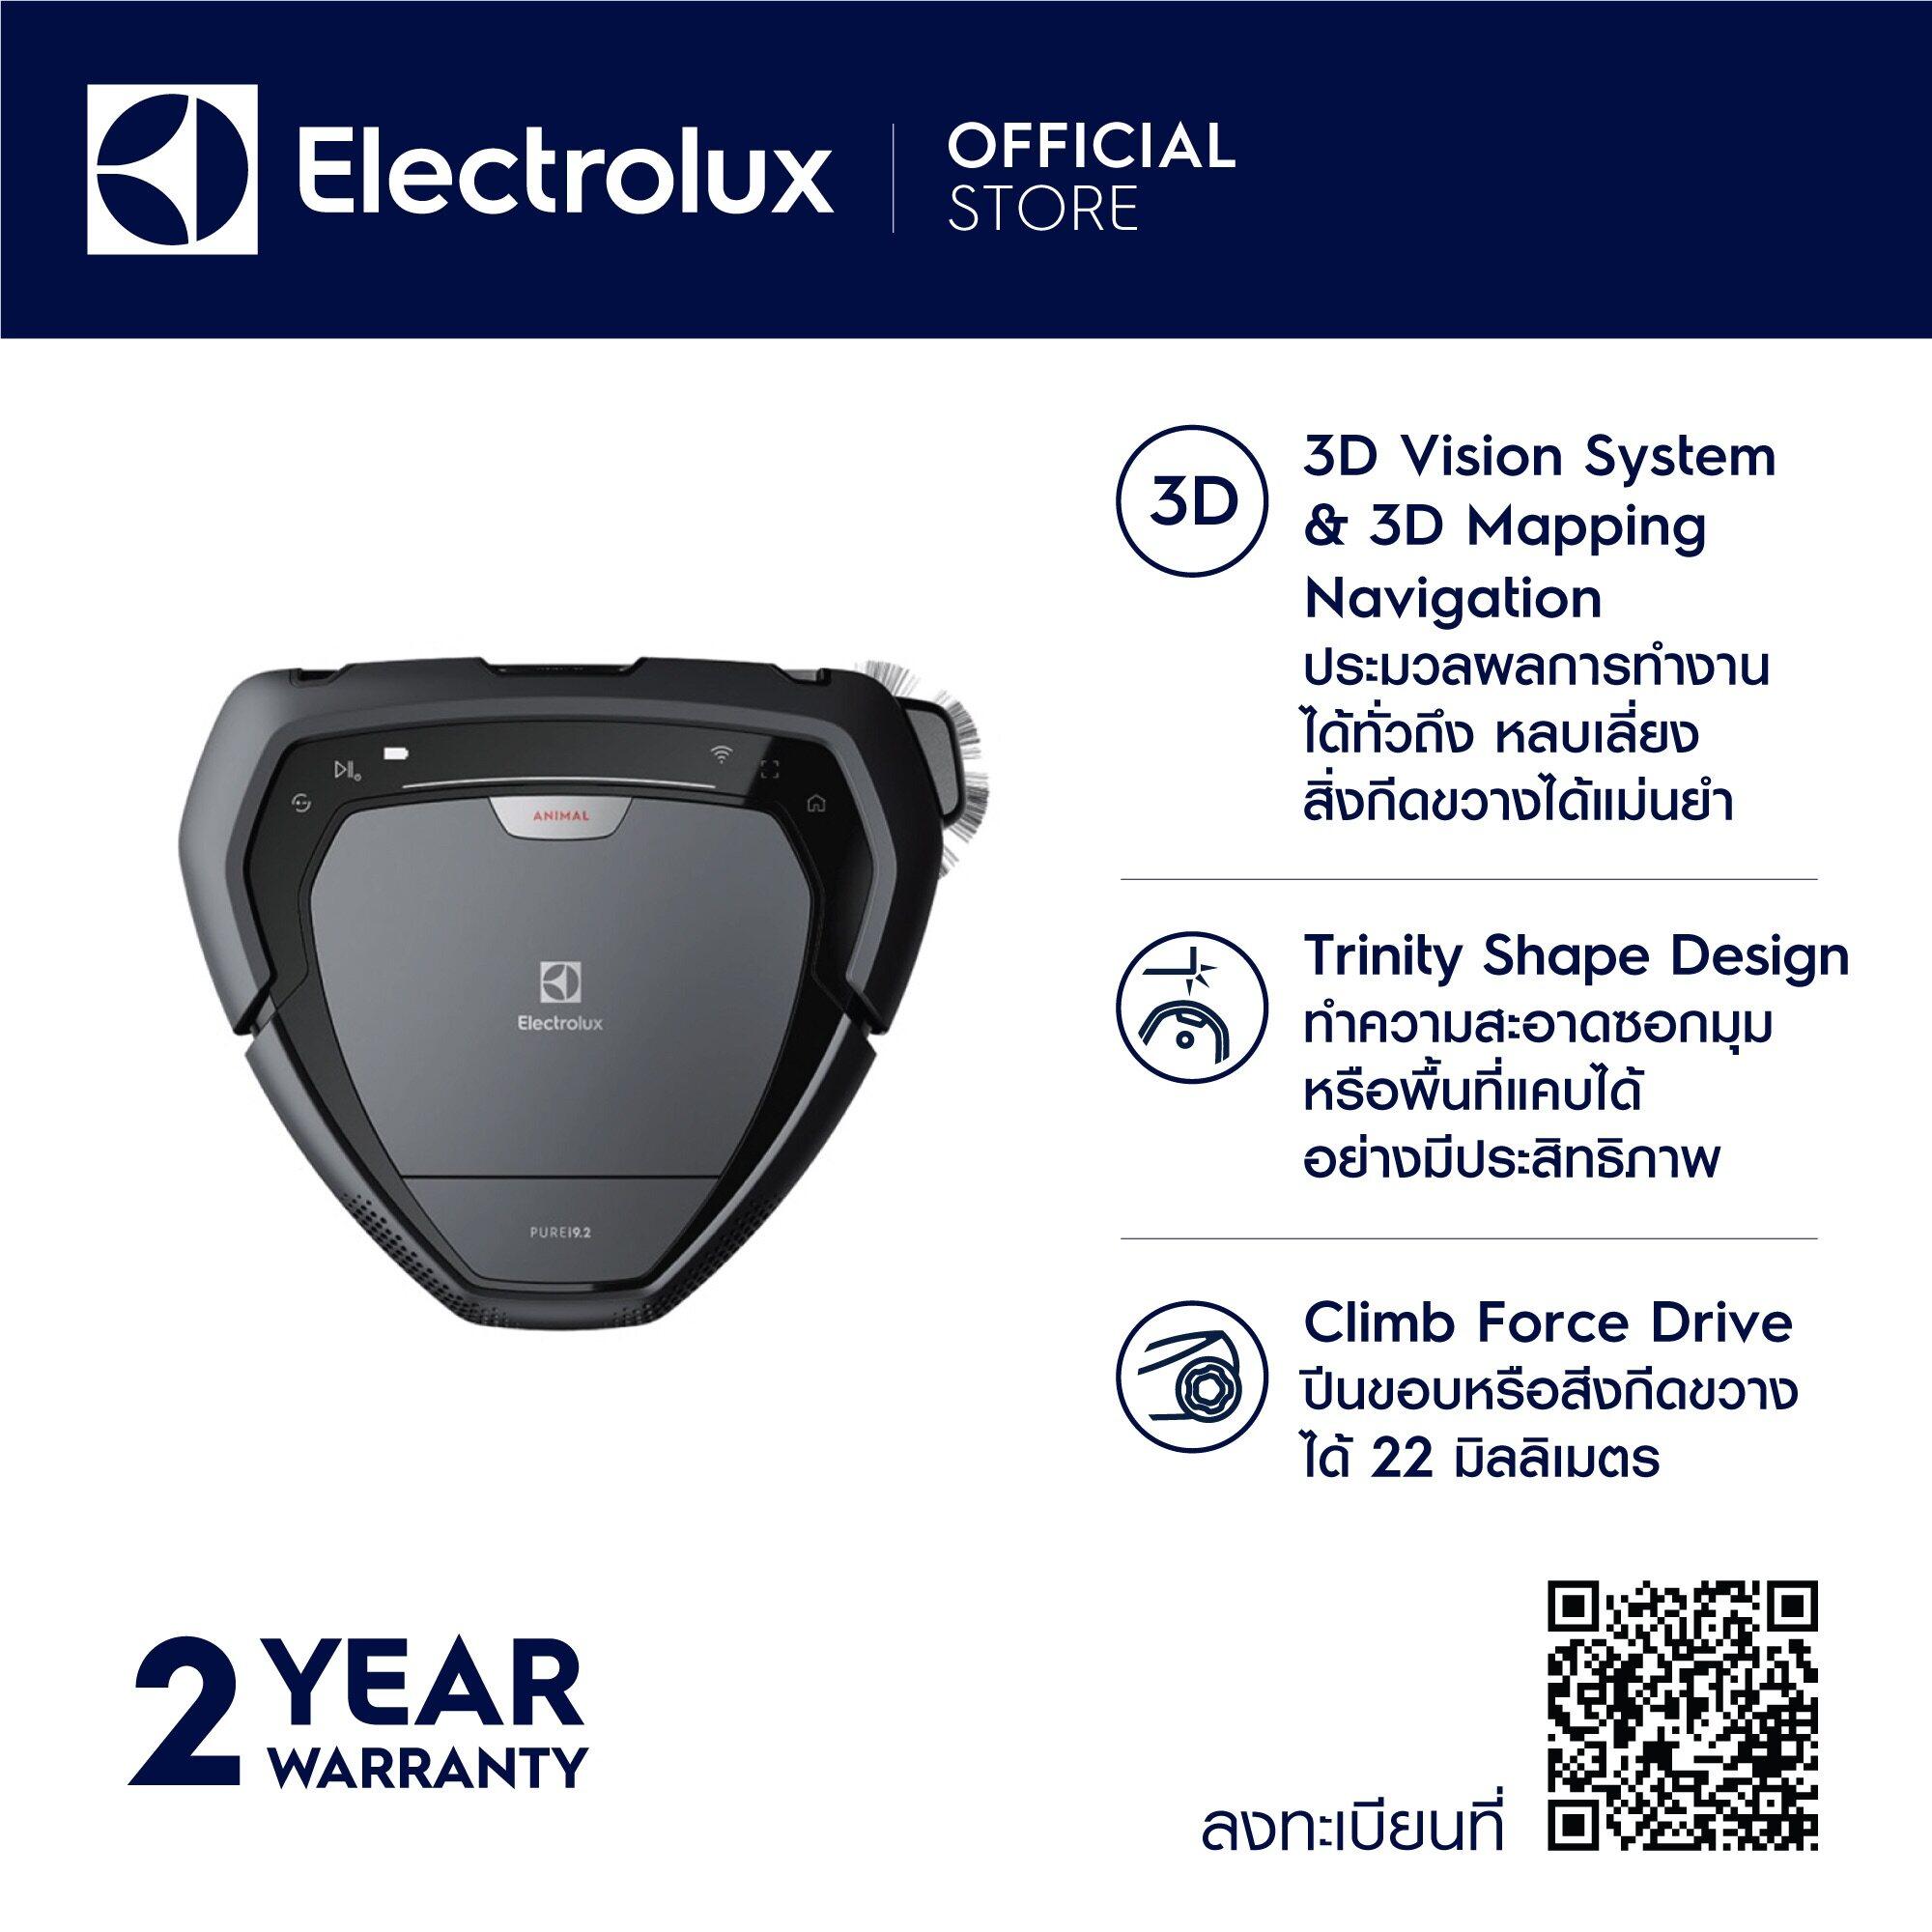 Electrolux เครื่องดูดฝุ่นหุ่นยนต์ รุ่นPI92-6SGM with 3D vision system?